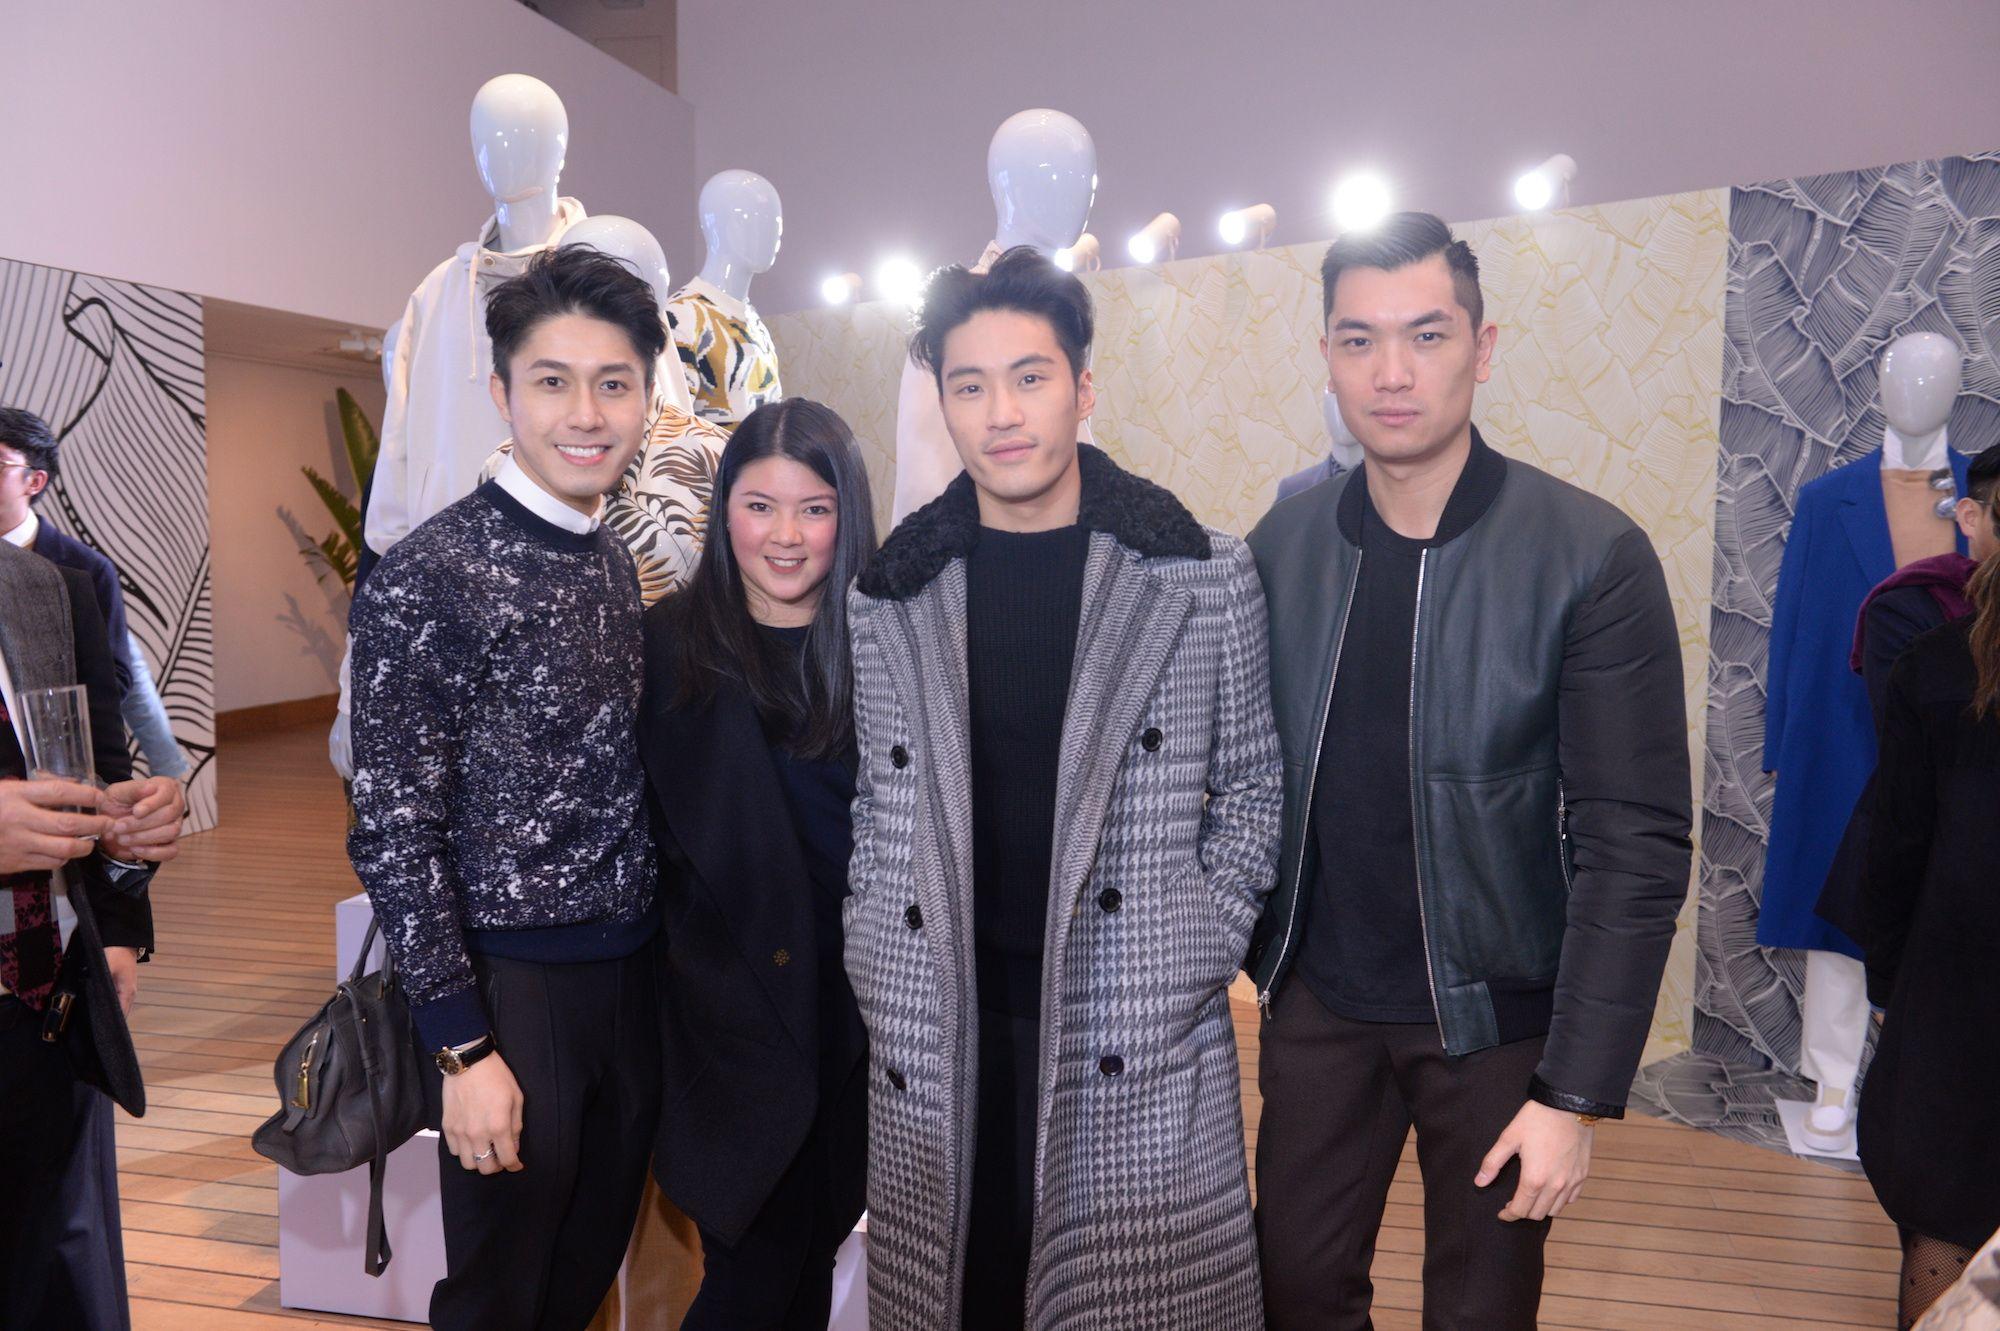 Edwin Pun, Amy Lee, Loui Lim, Justin Ng